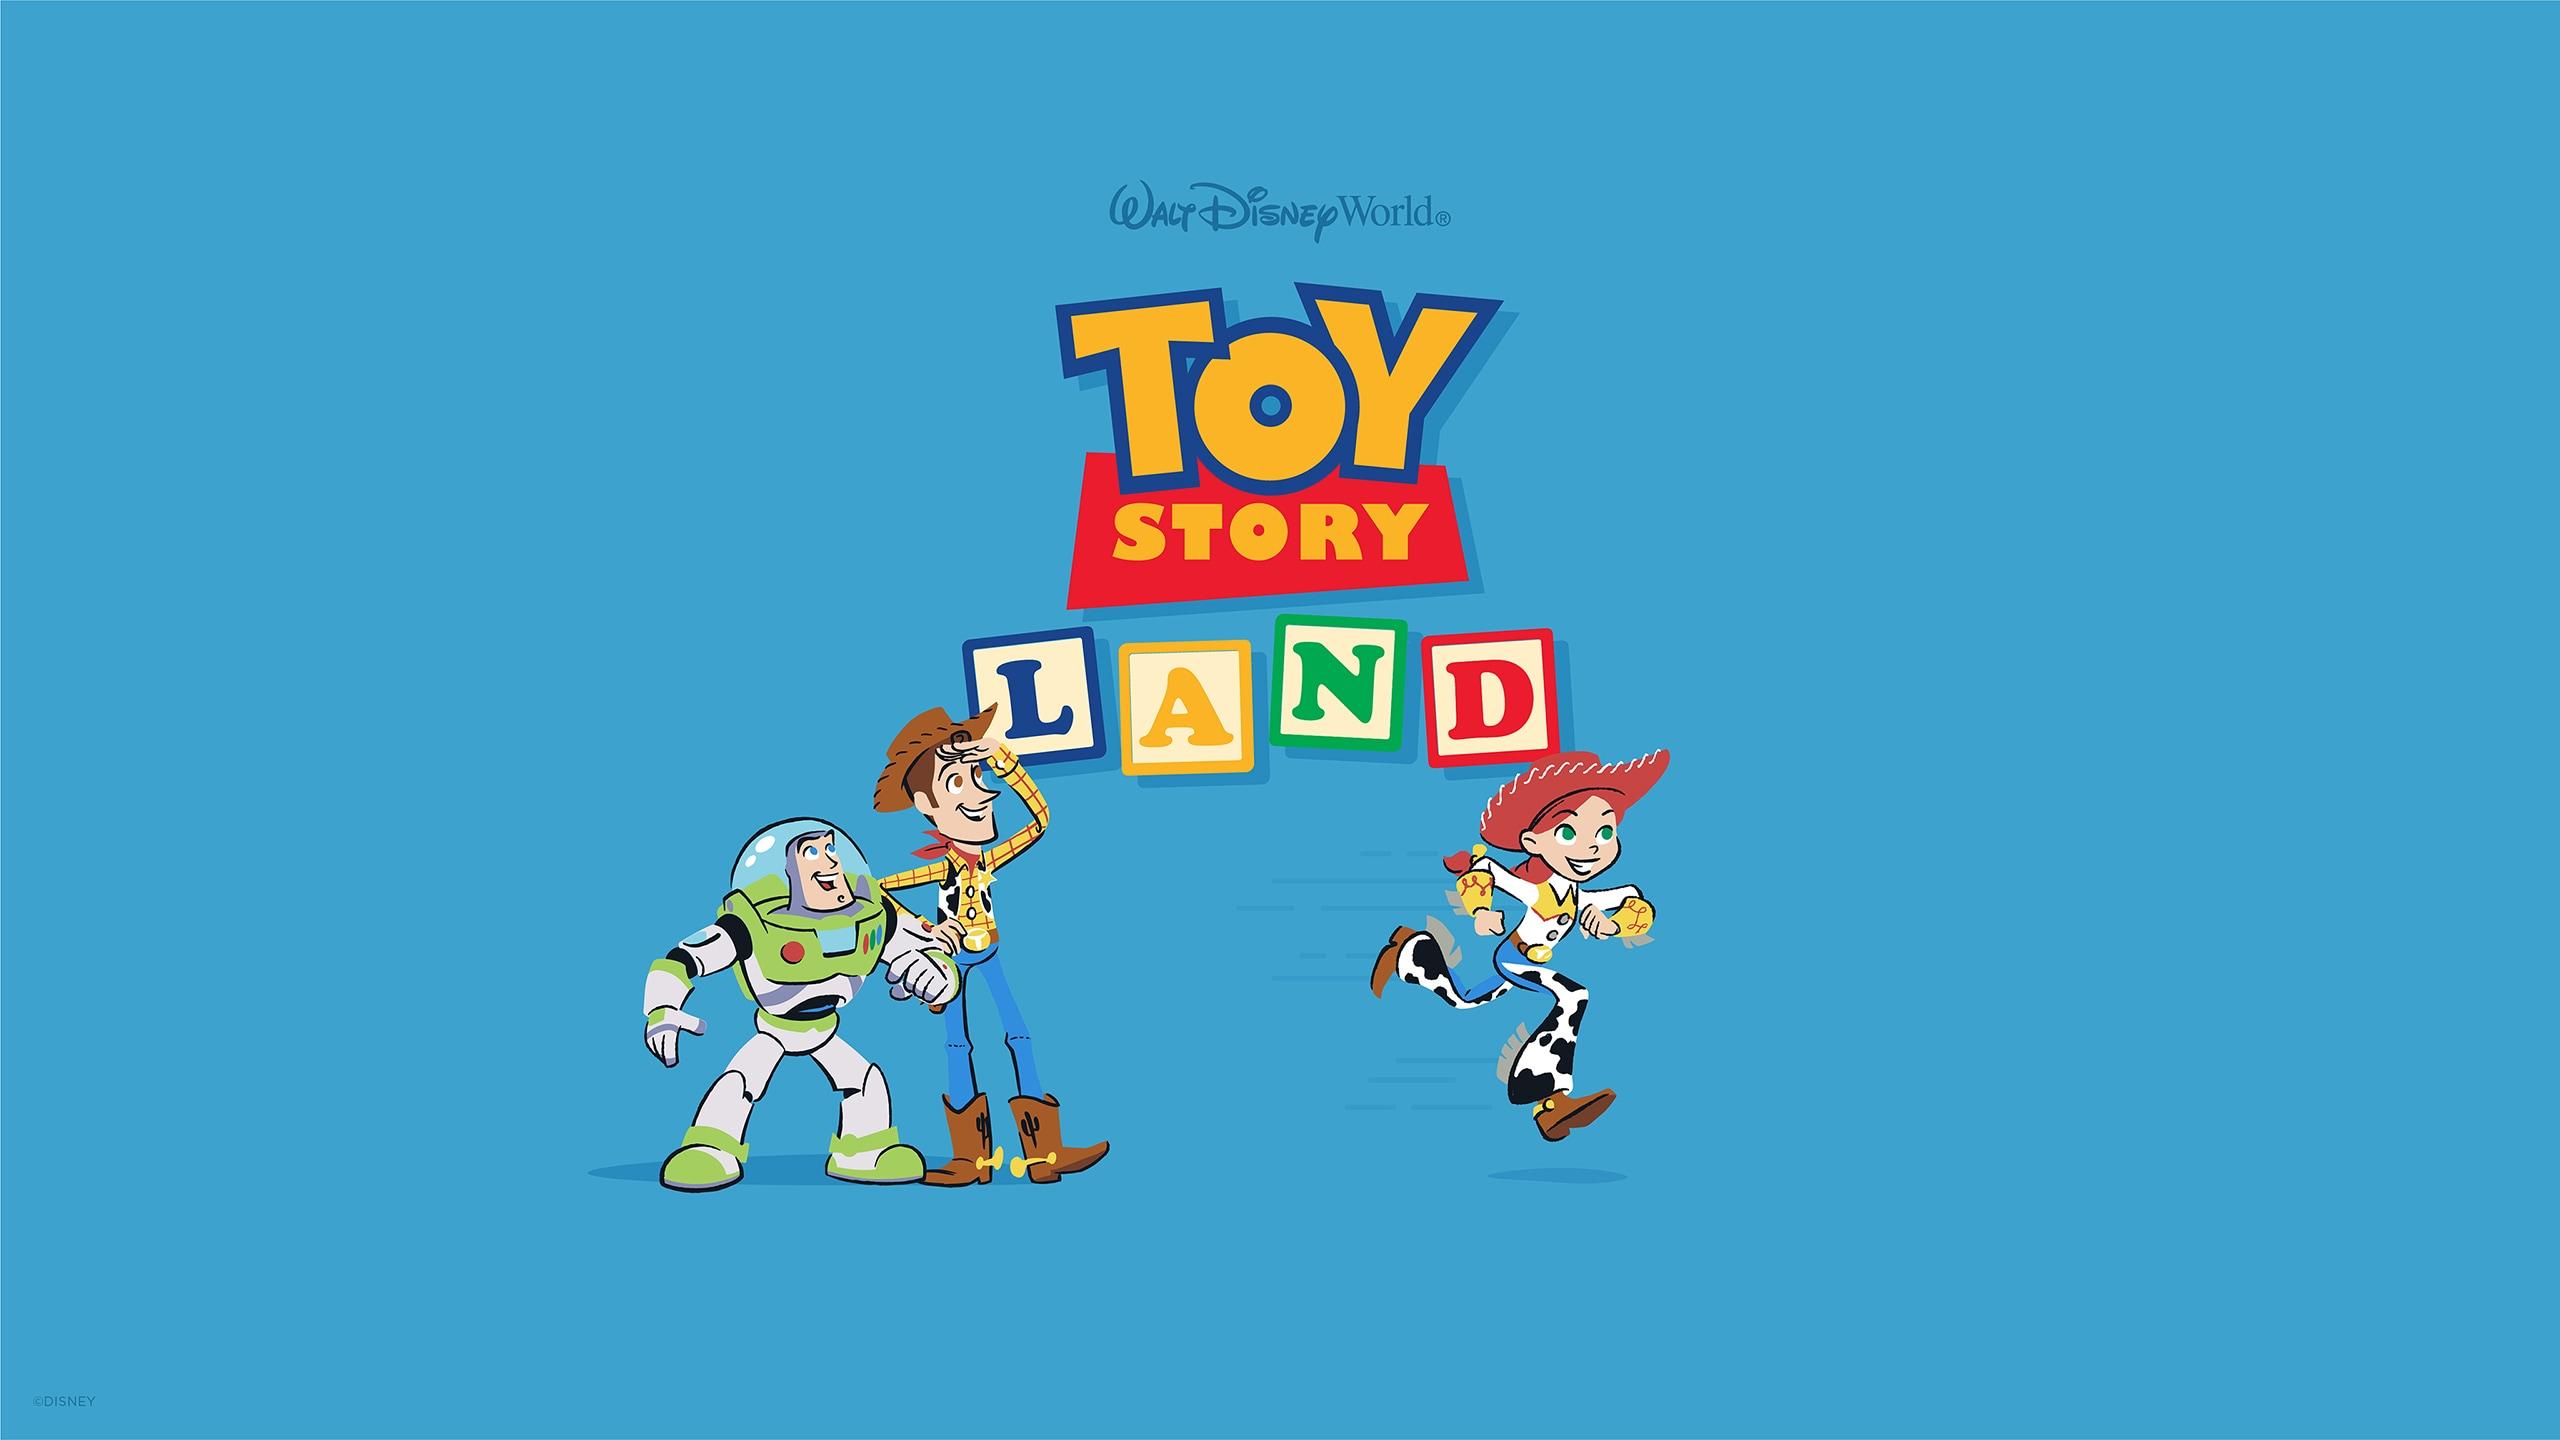 Toy story land wallpaper desktop disney parks blog - Toy story wallpaper ...